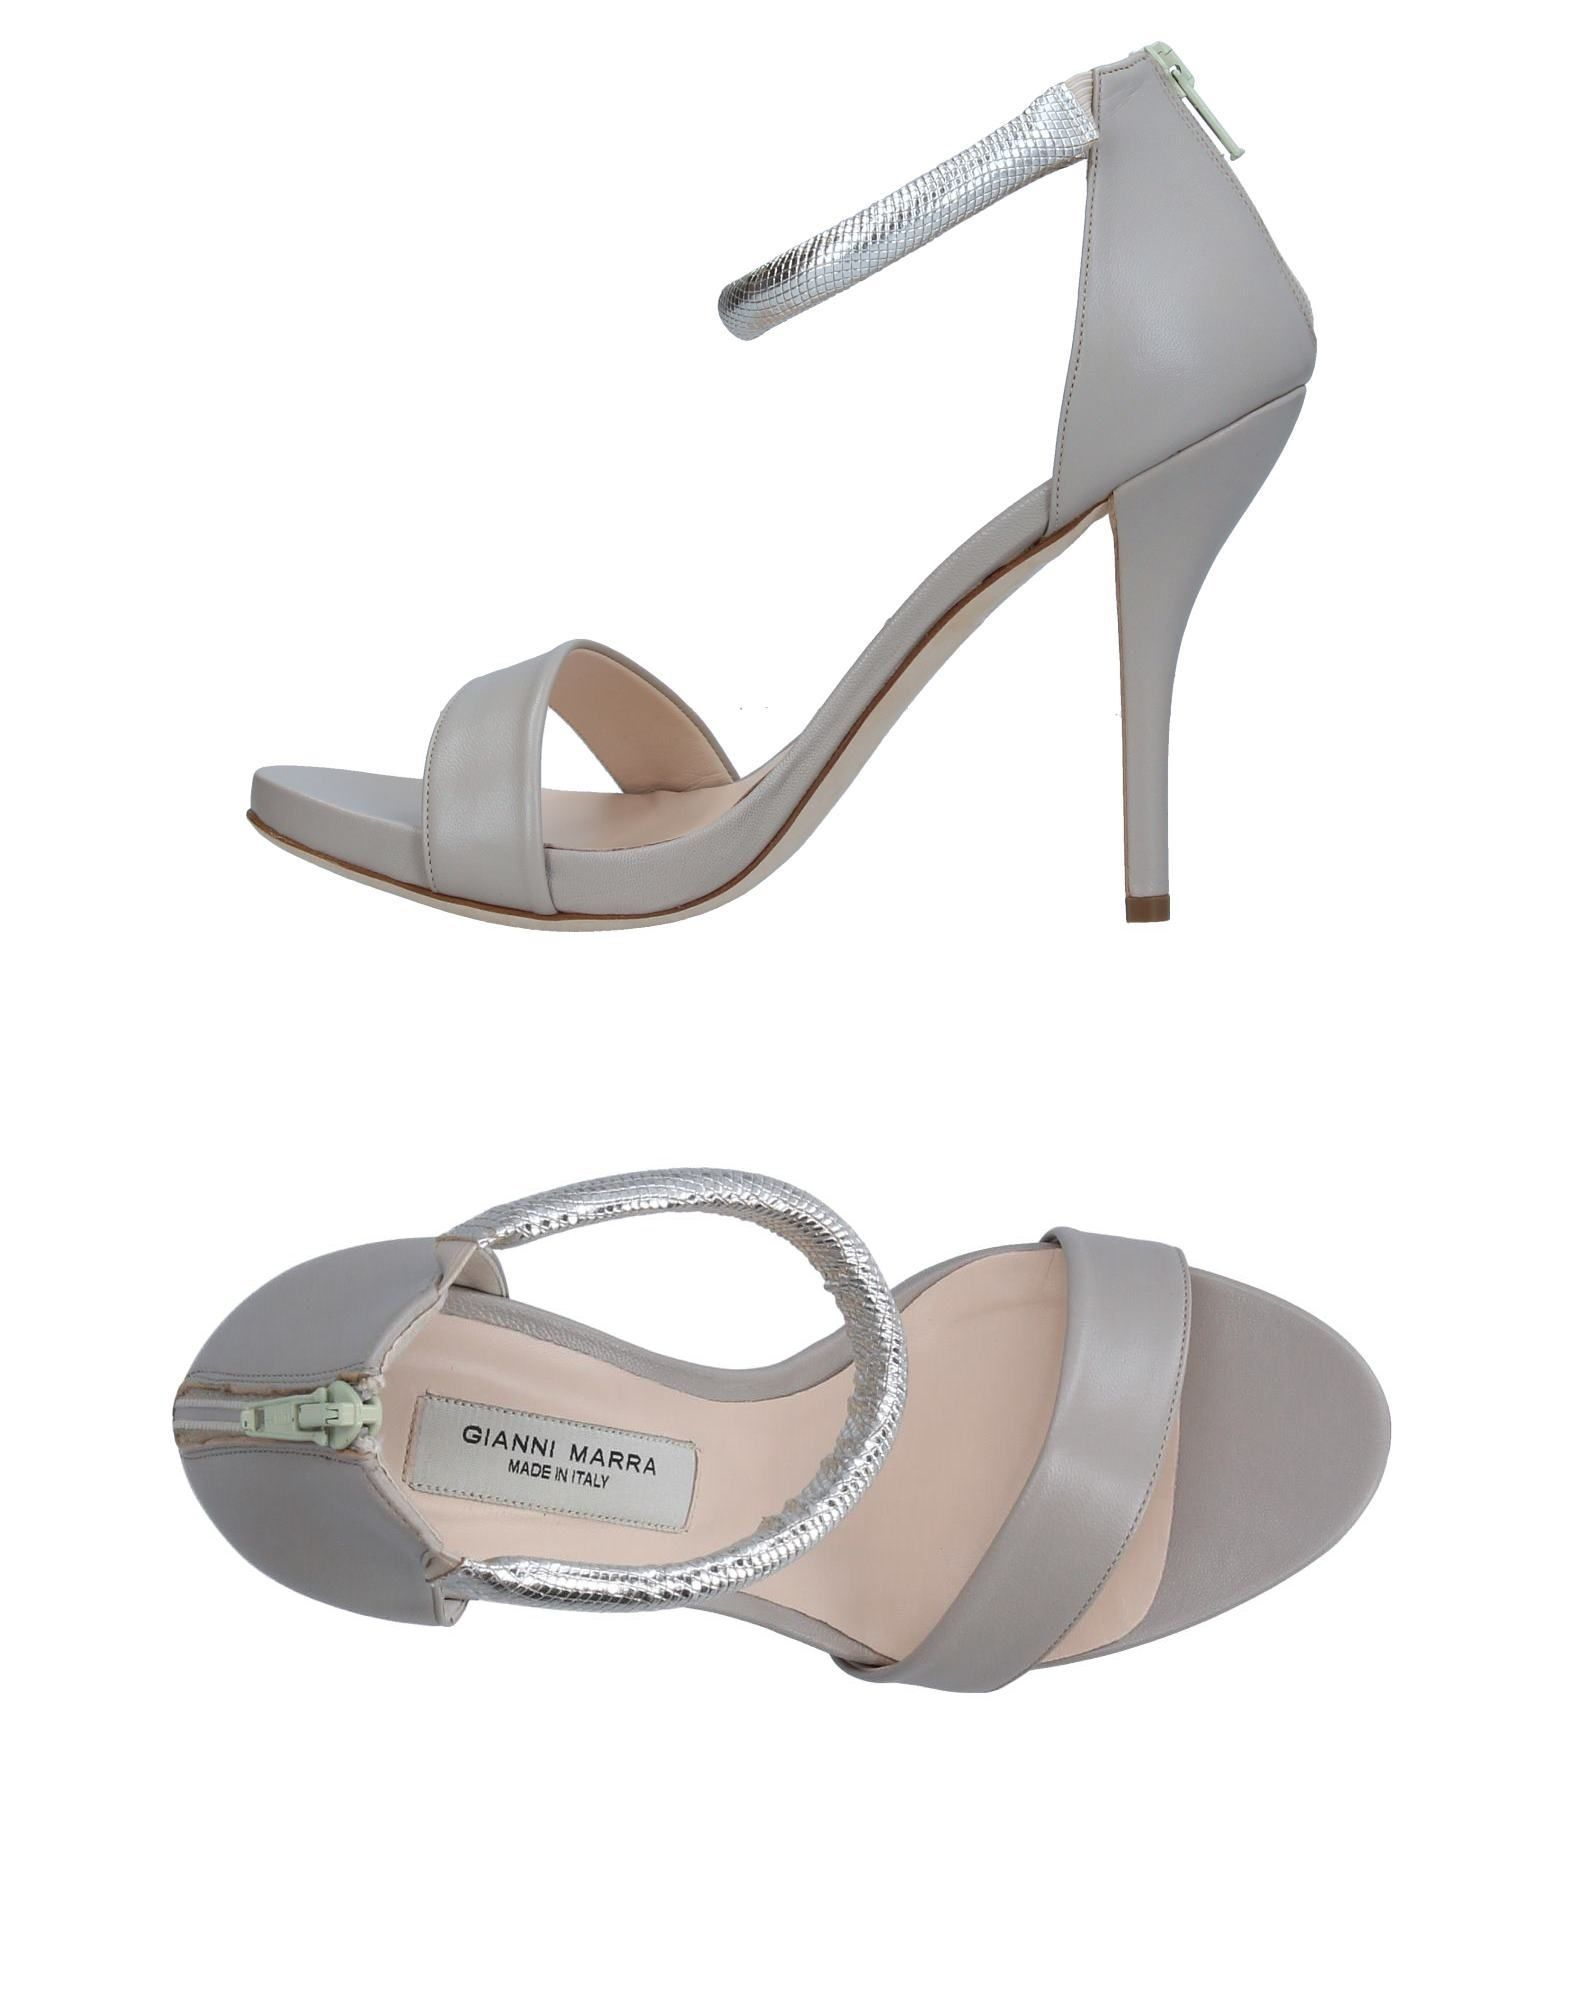 Gianni Marra Sandalen Damen  11358785VA Gute Qualität beliebte Schuhe